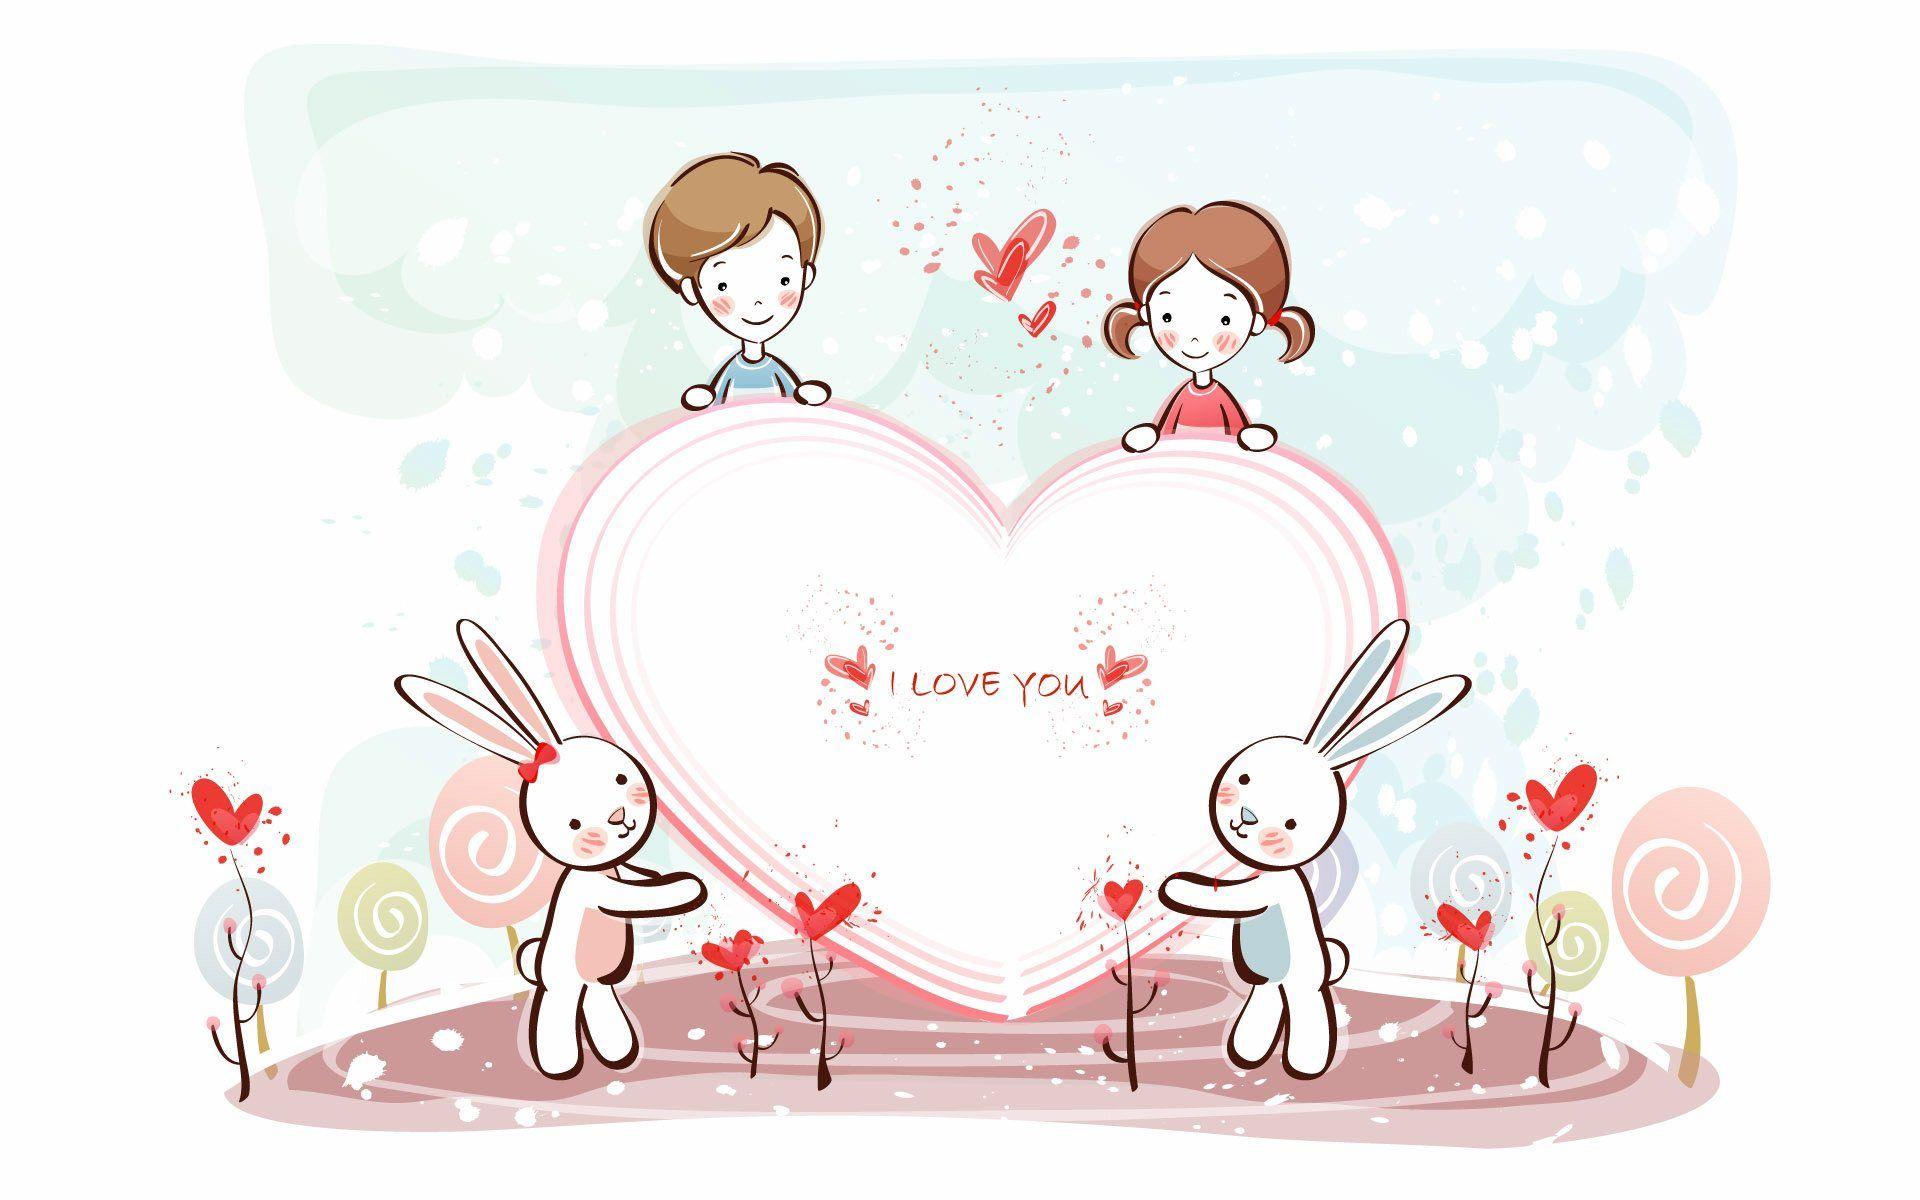 Wonderful Wallpaper I Love You Cartoon - a47654eb99ad35b3be9addda1607a1bb  Snapshot_84851   .jpg